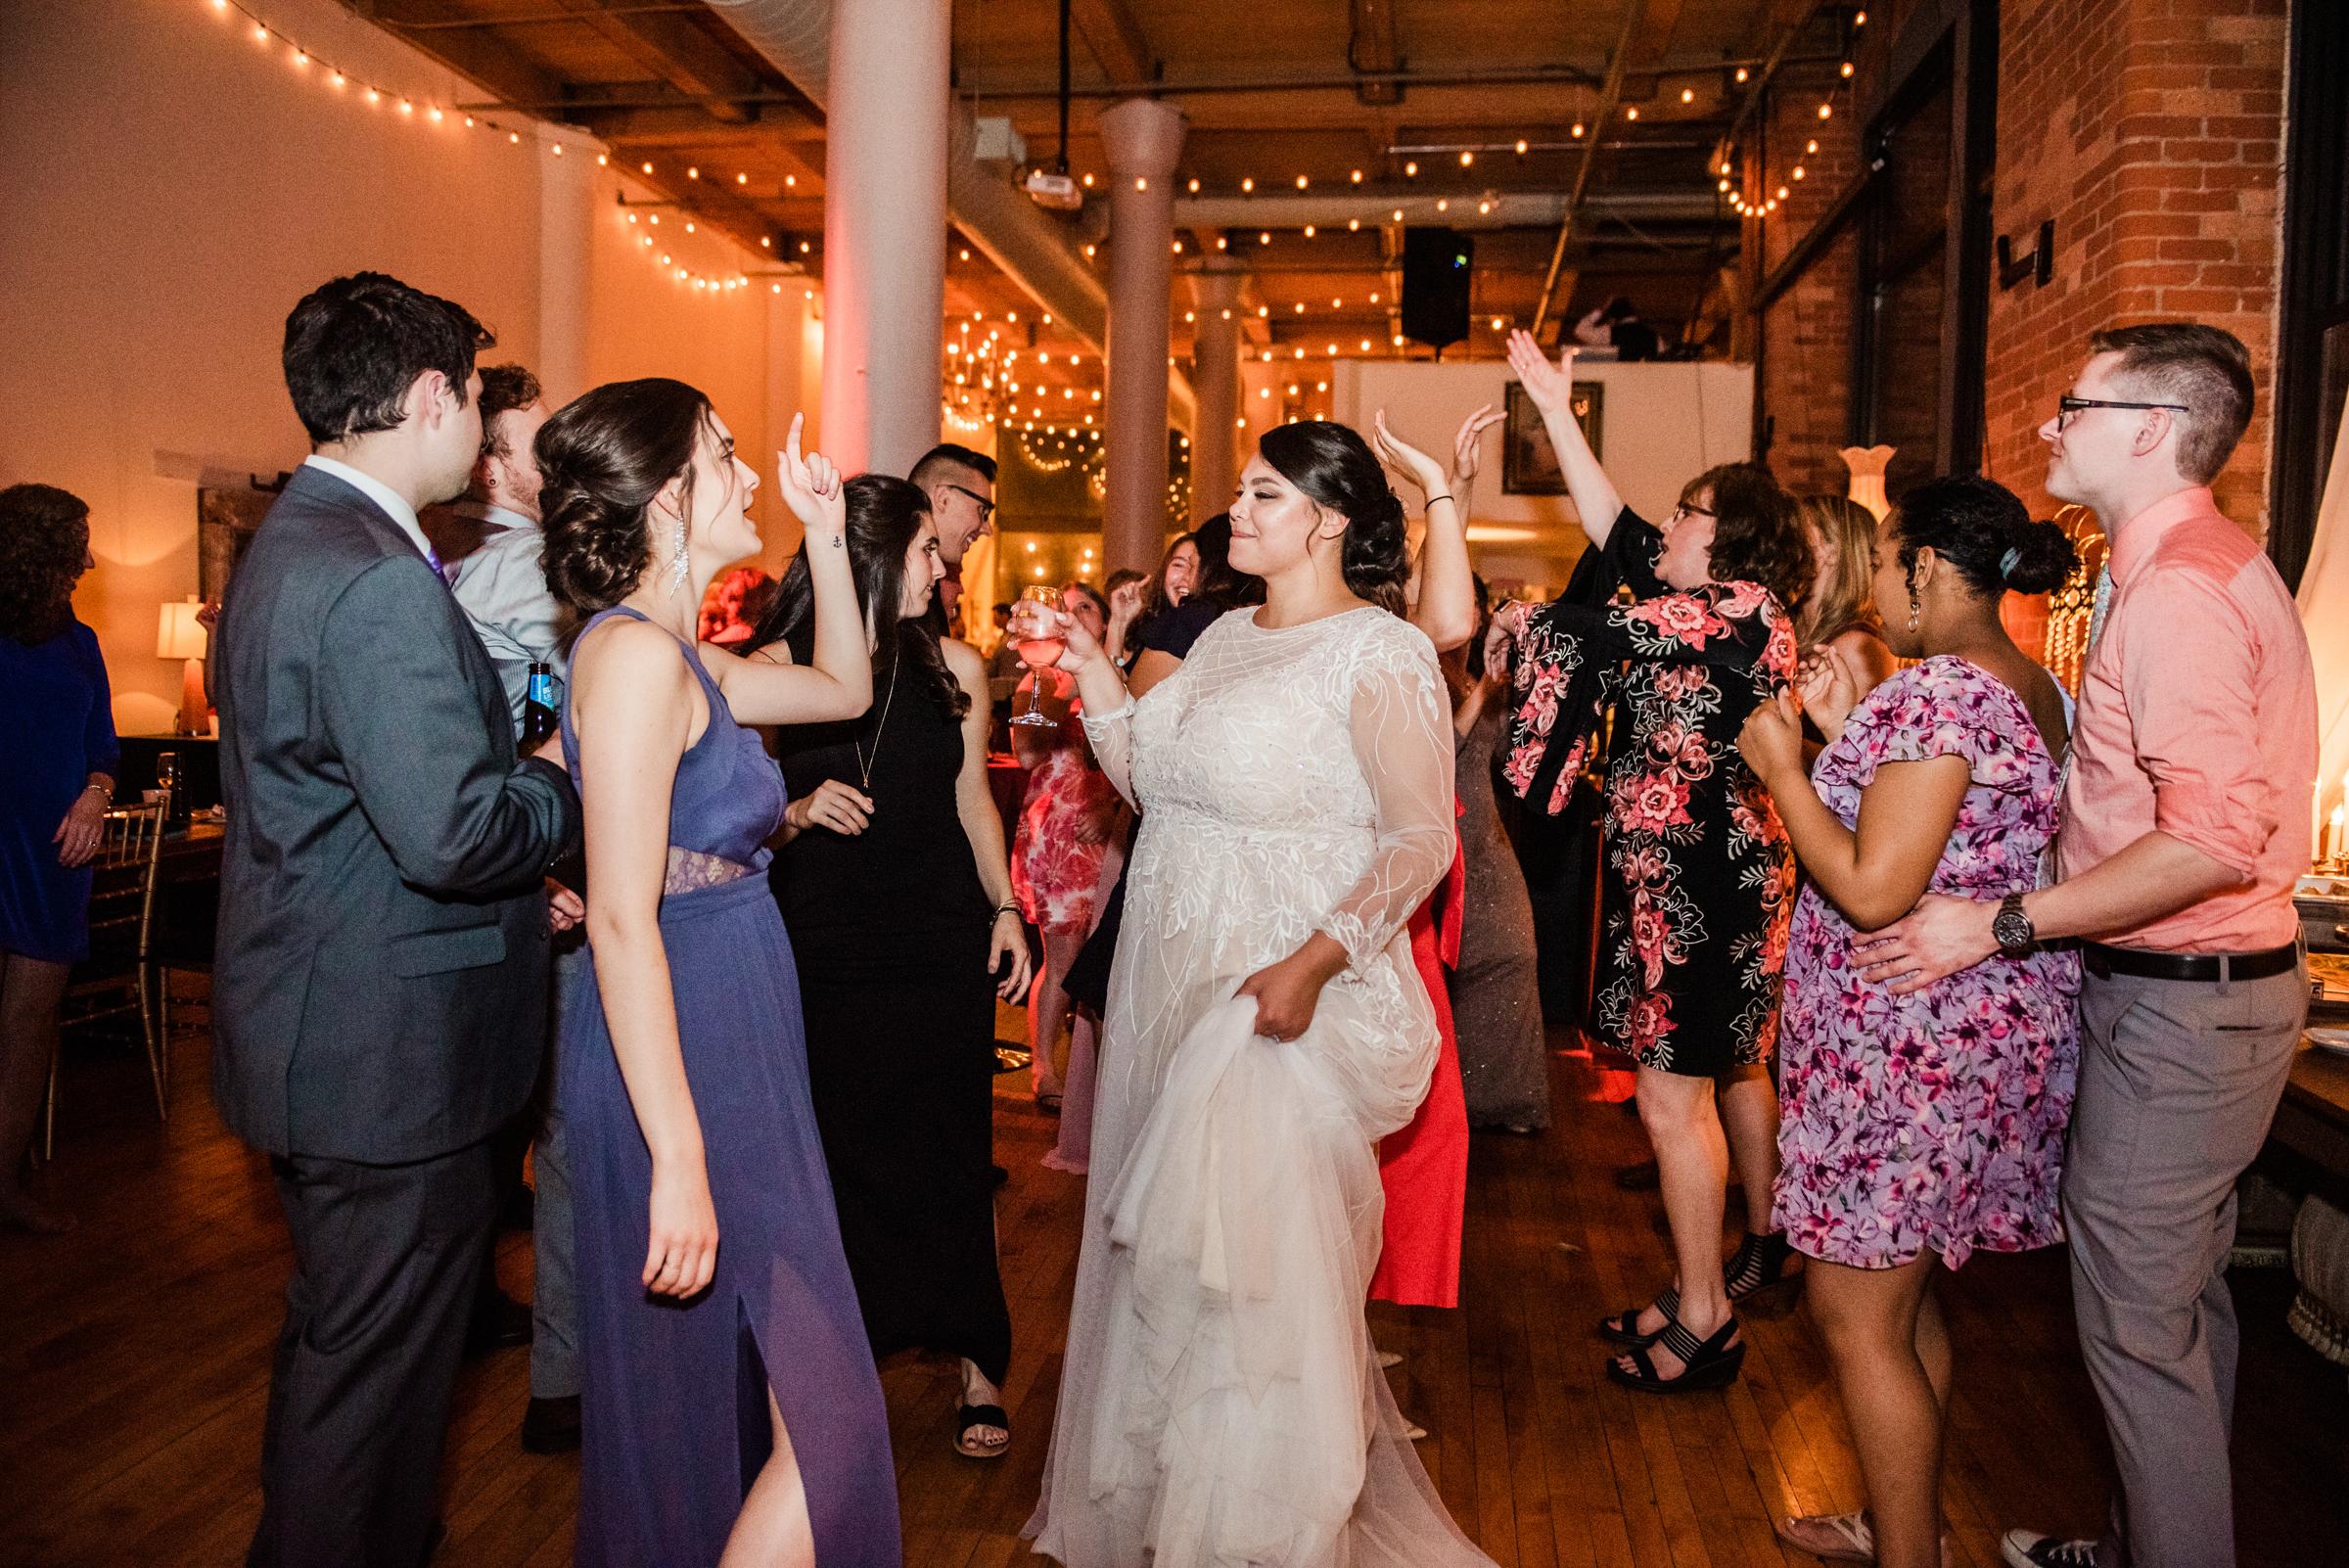 Studio_180_Lamberton_Conservatory_Rochester_Wedding_JILL_STUDIO_Rochester_NY_Photographer_DSC_9493.jpg